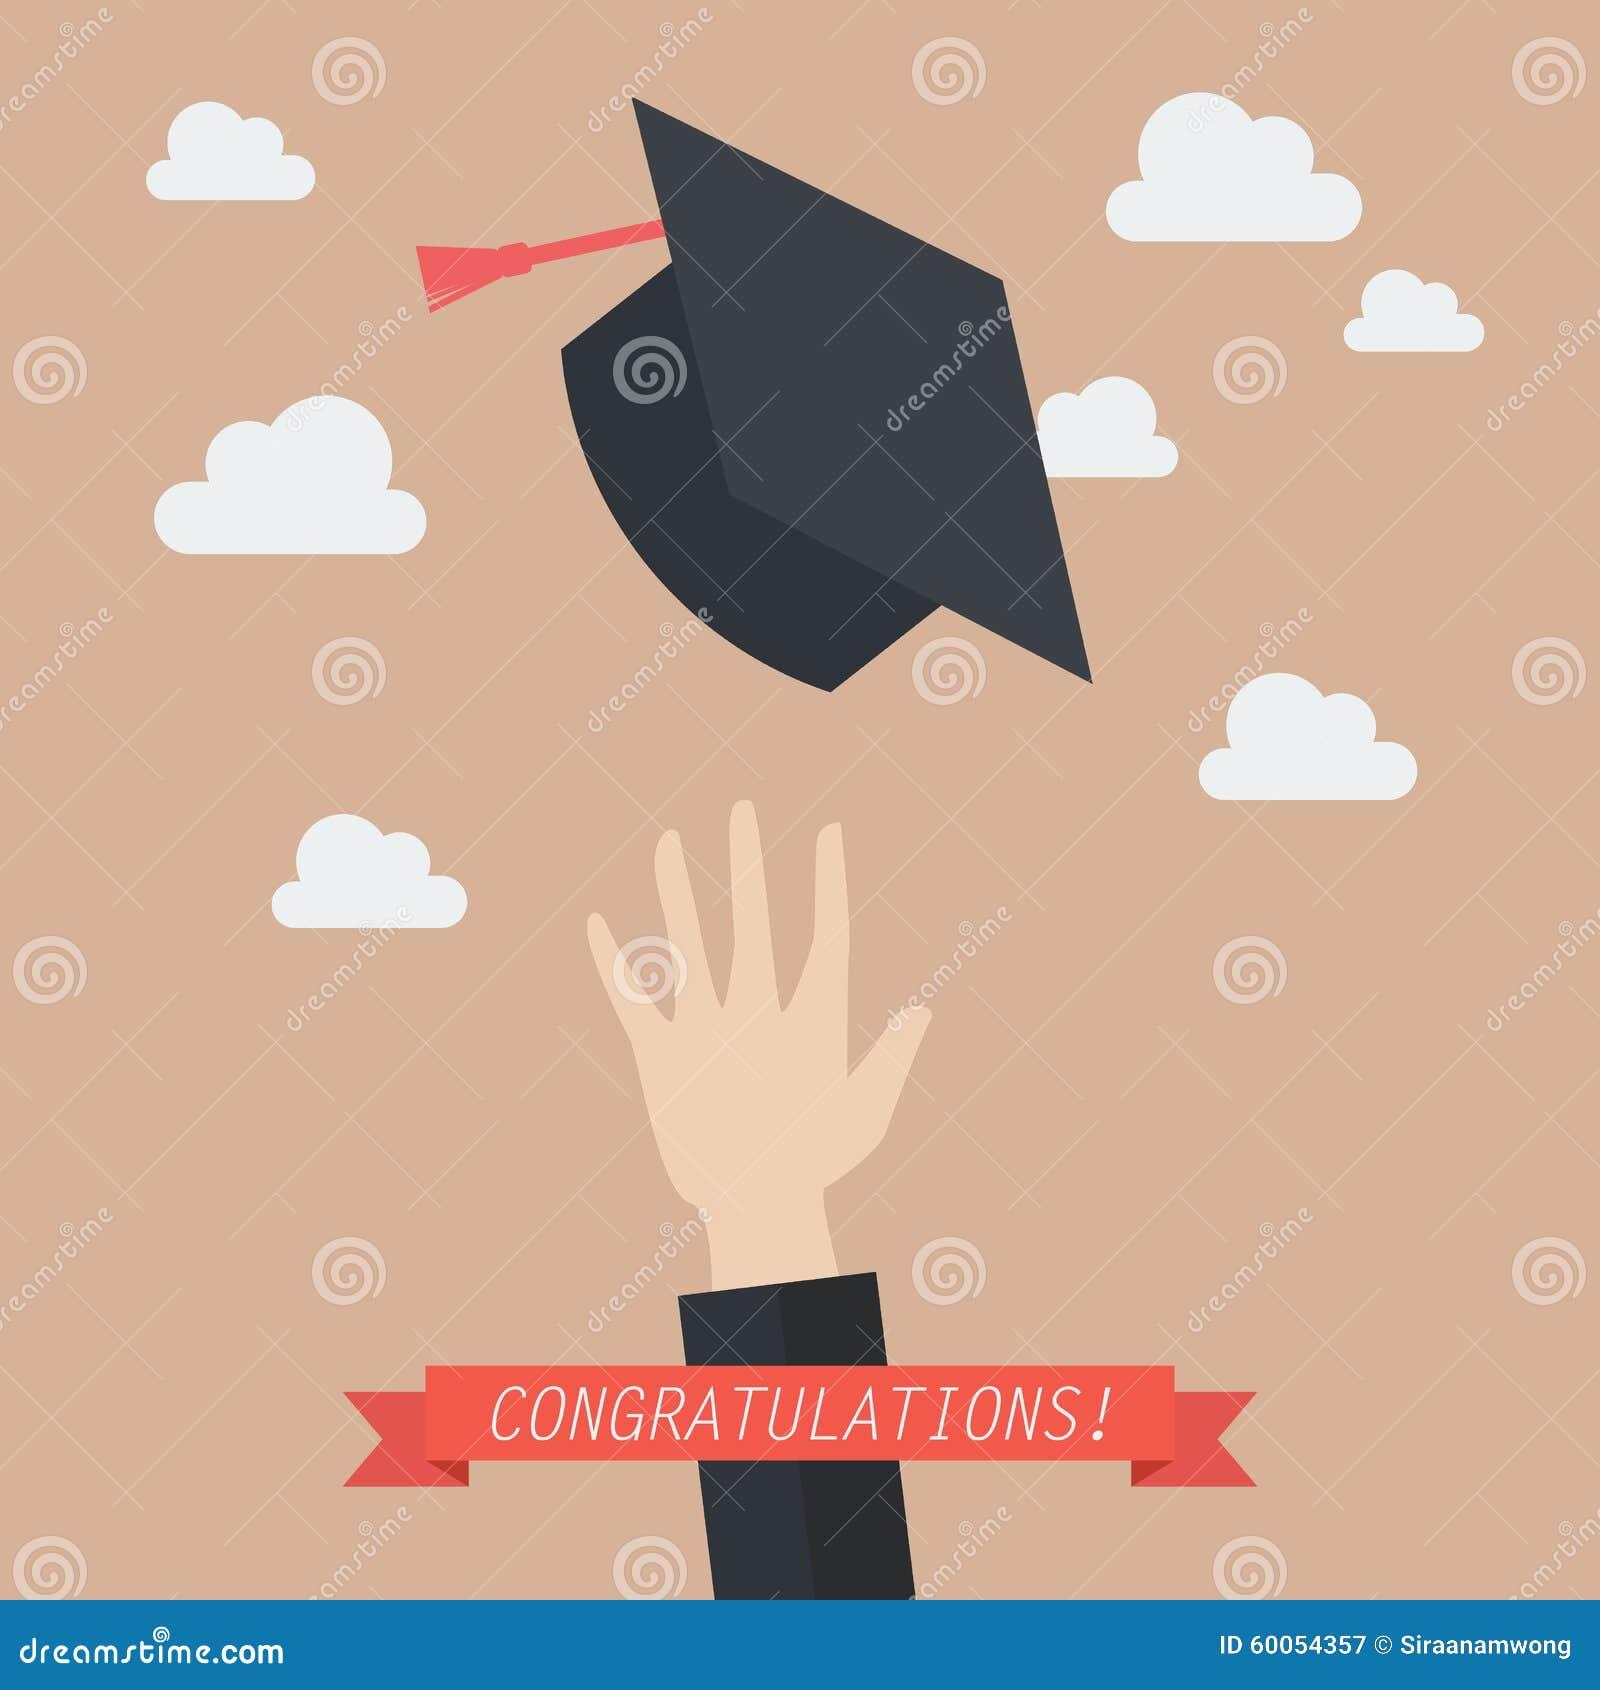 Graduation Hats In The Air Cartoon Vector | CartoonDealer ...